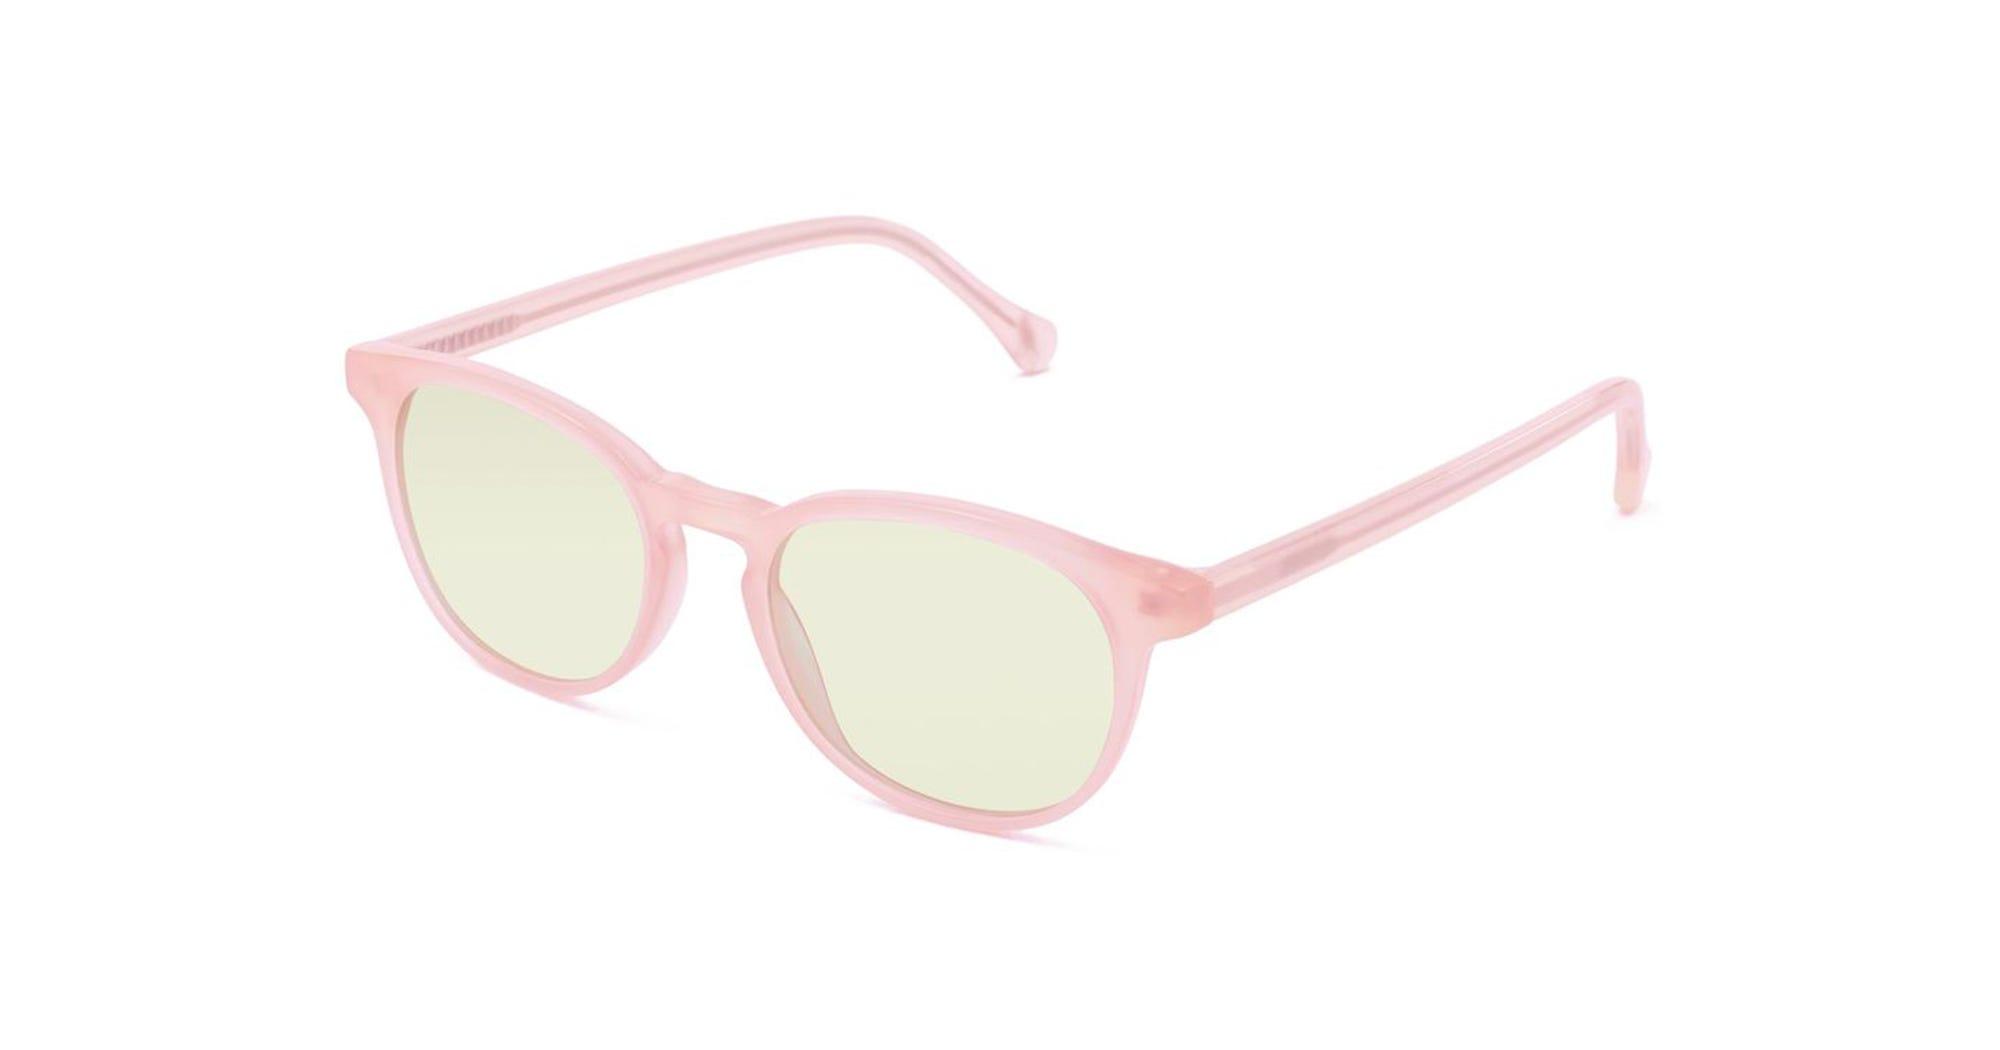 Best Blue Light Blocking Glasses For Women Computer Use